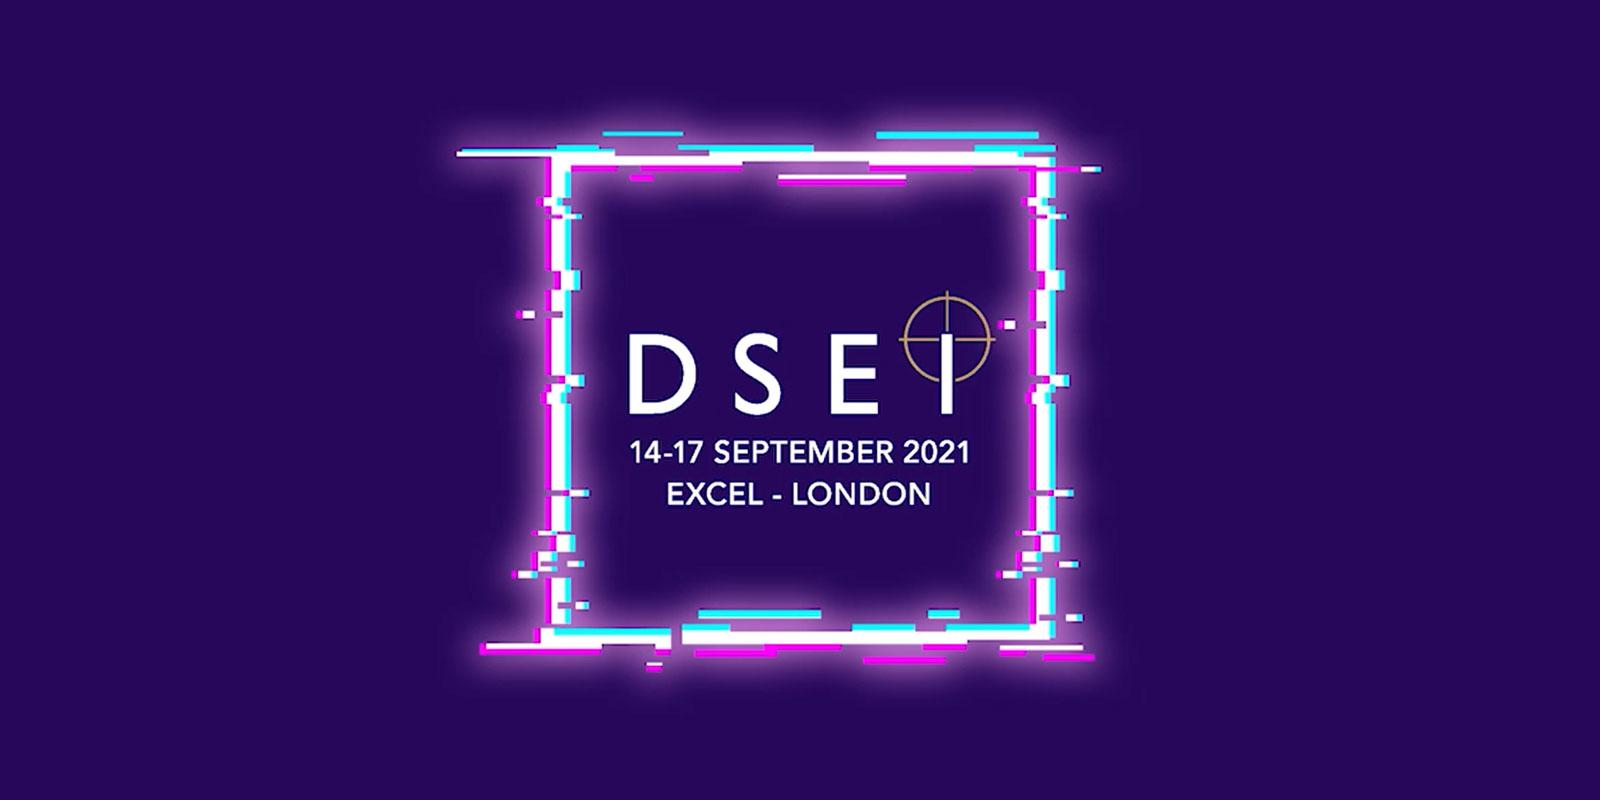 DSEI 2021 graphic